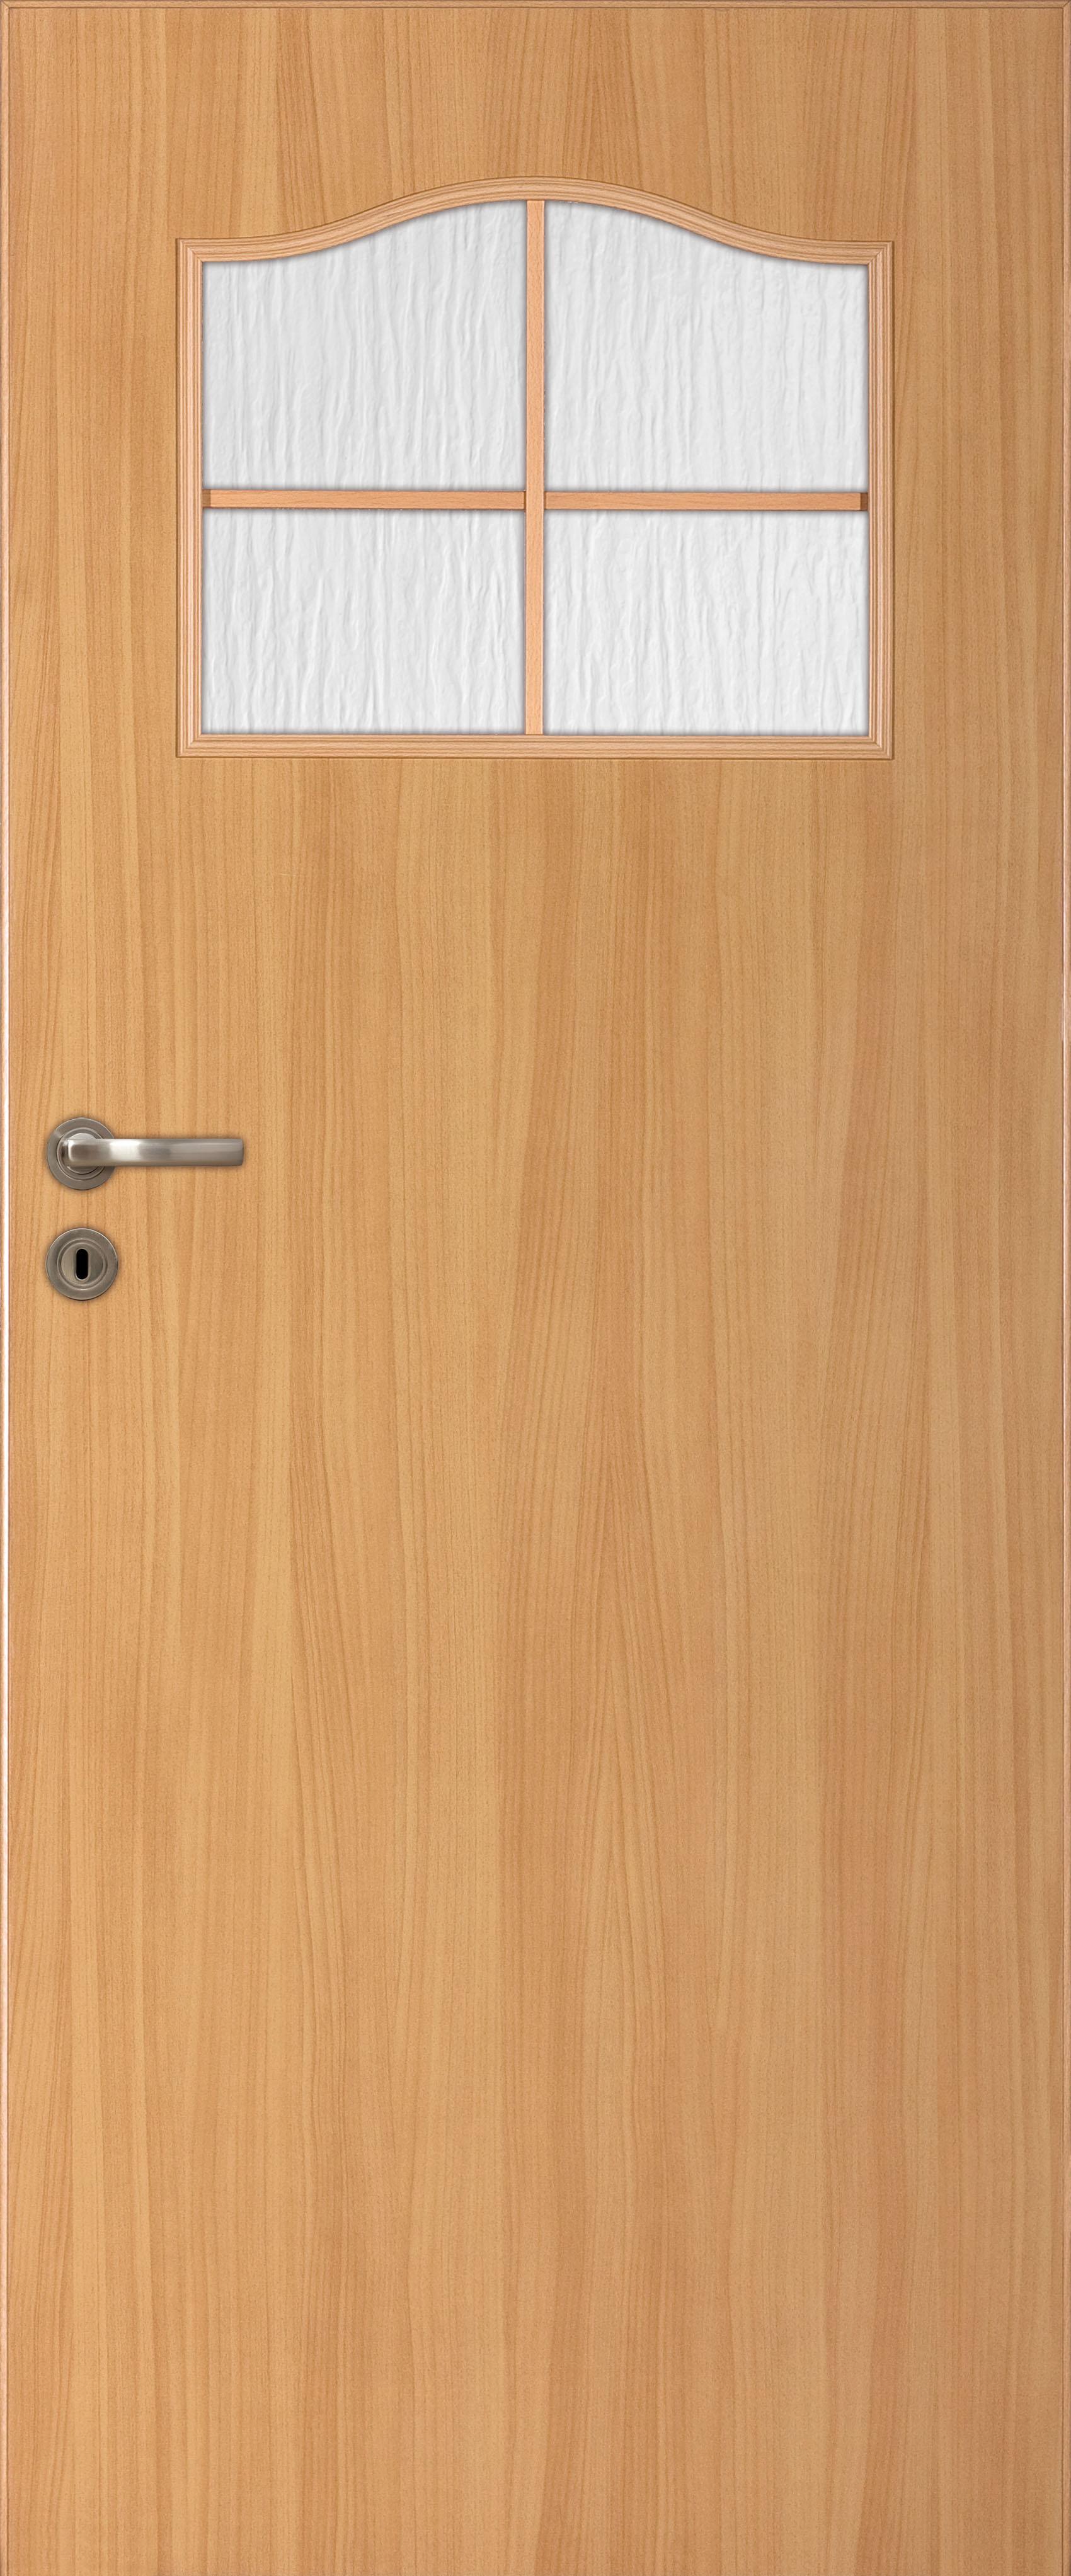 Skrzydła Drzwi Dre Lack